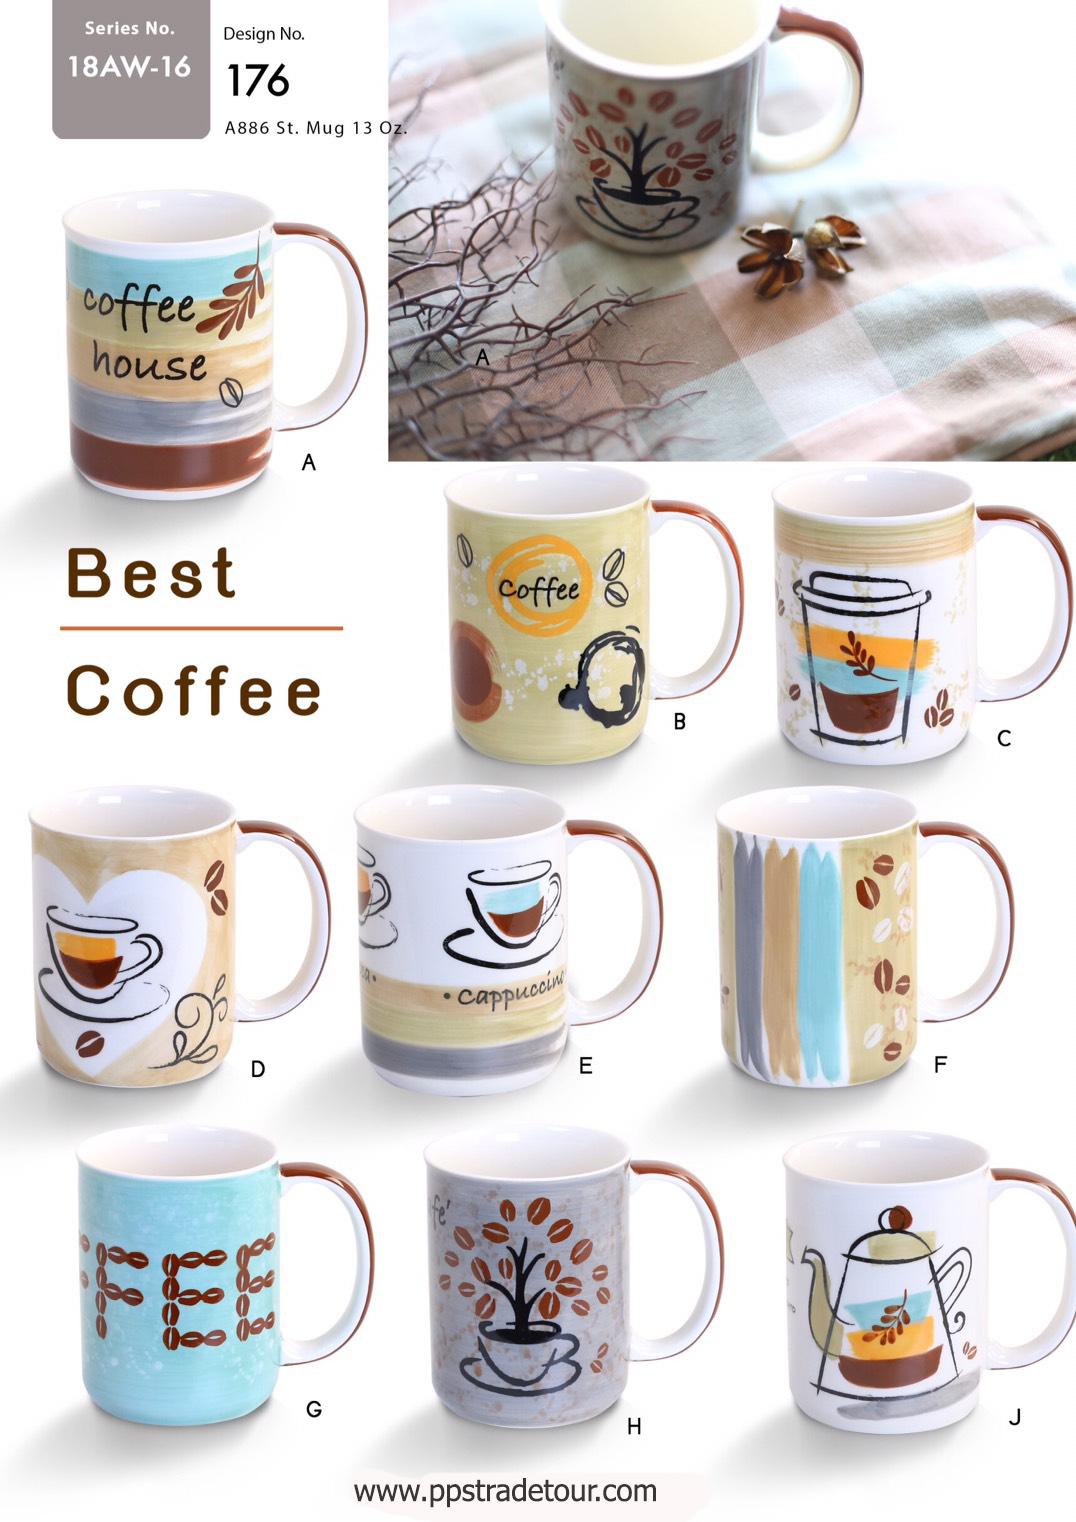 Best Coffee-Ceramic Mug 13 Oz.